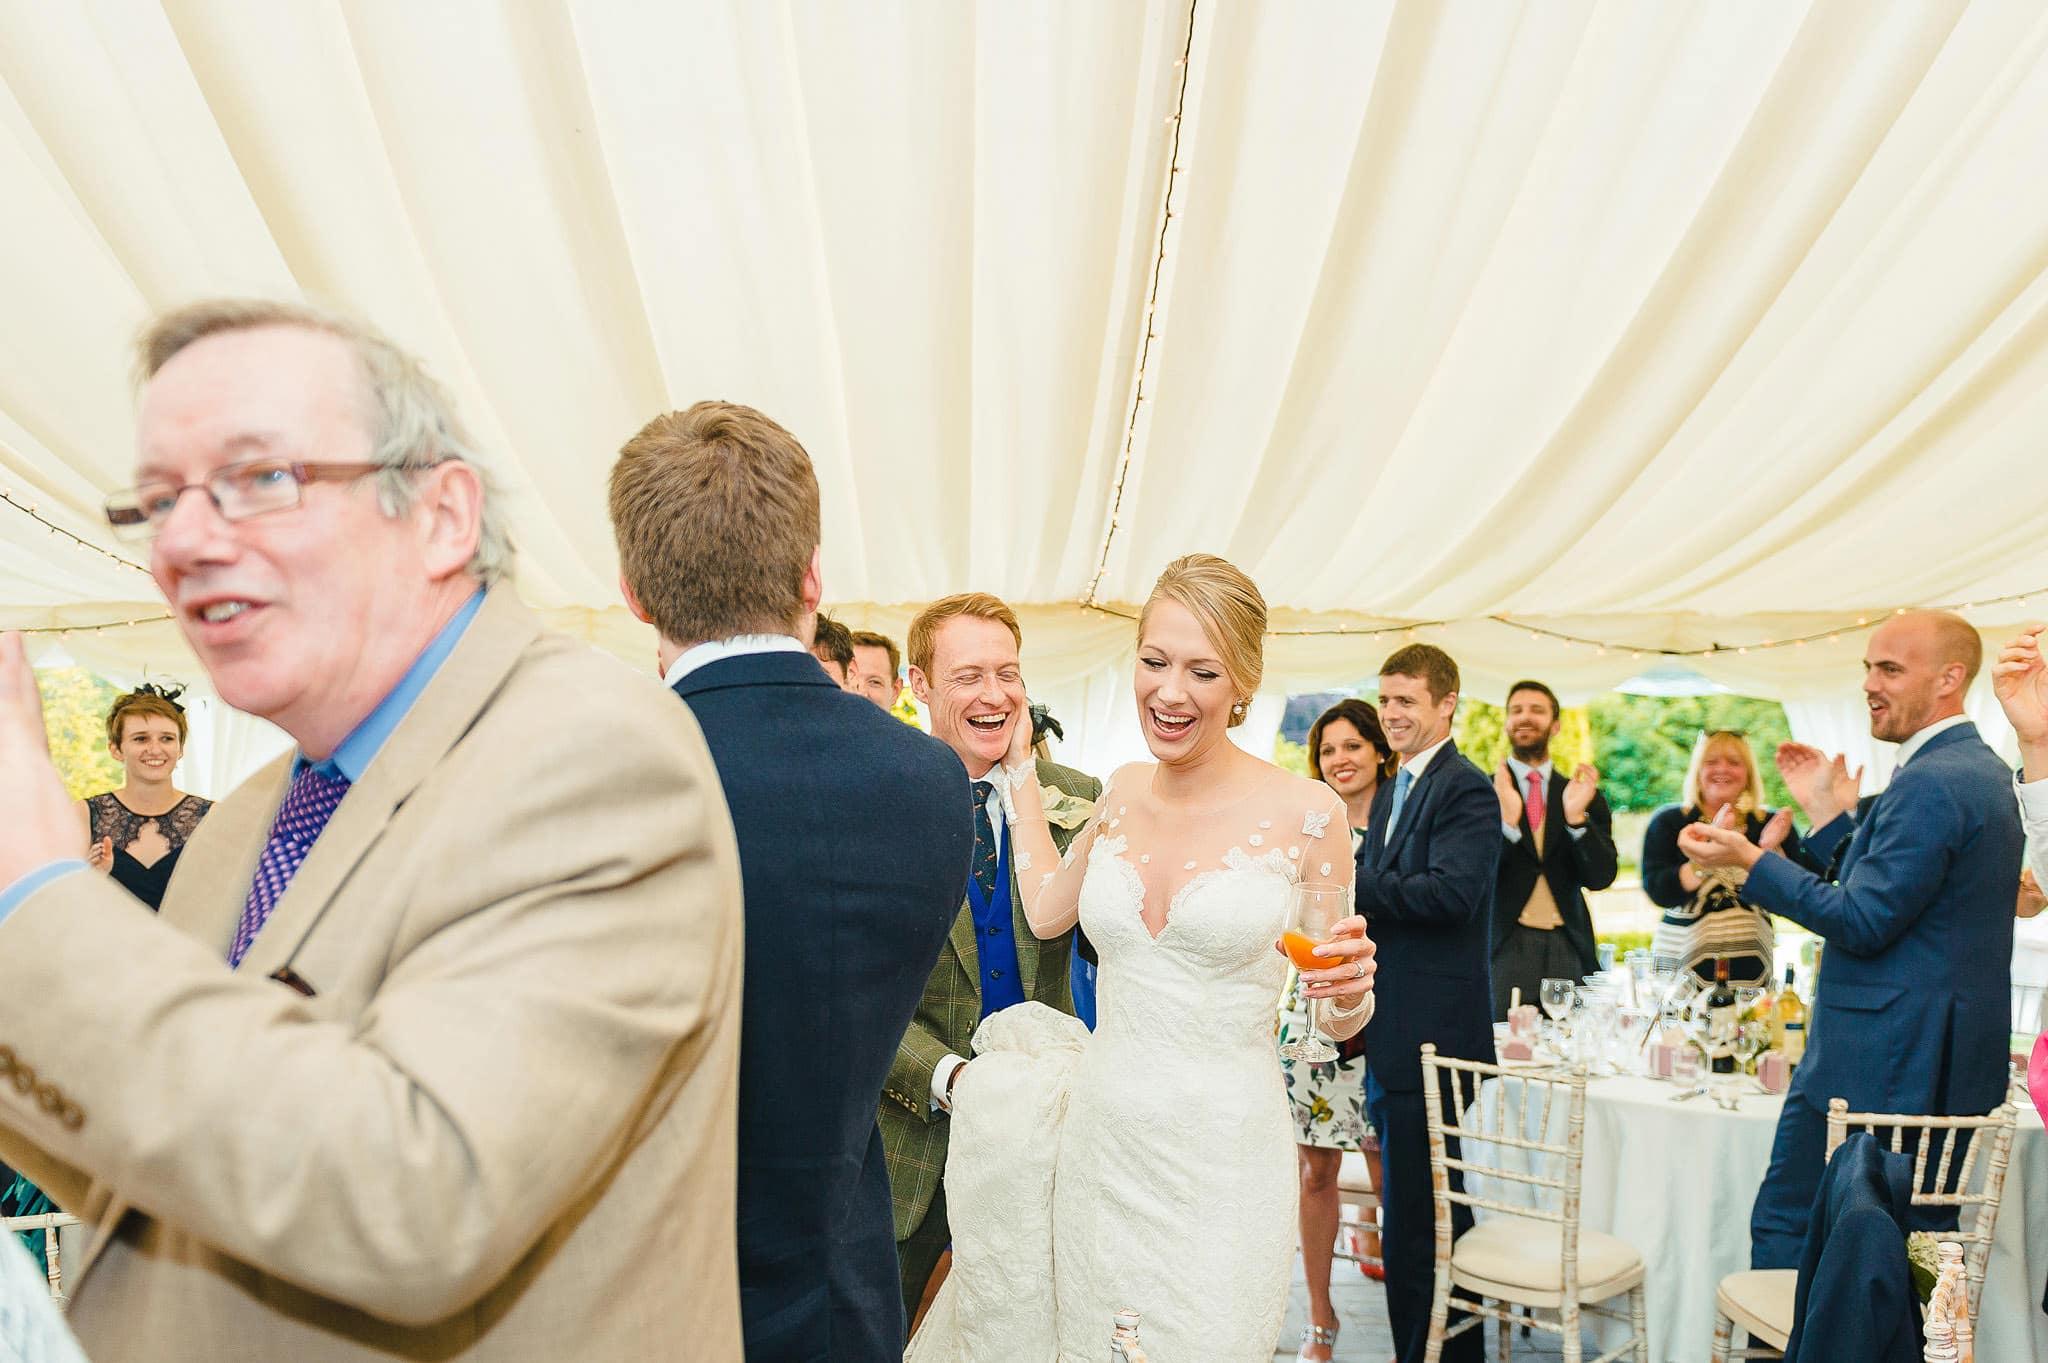 Lemore Manor Wedding Photographer | Hannah and Angus 83